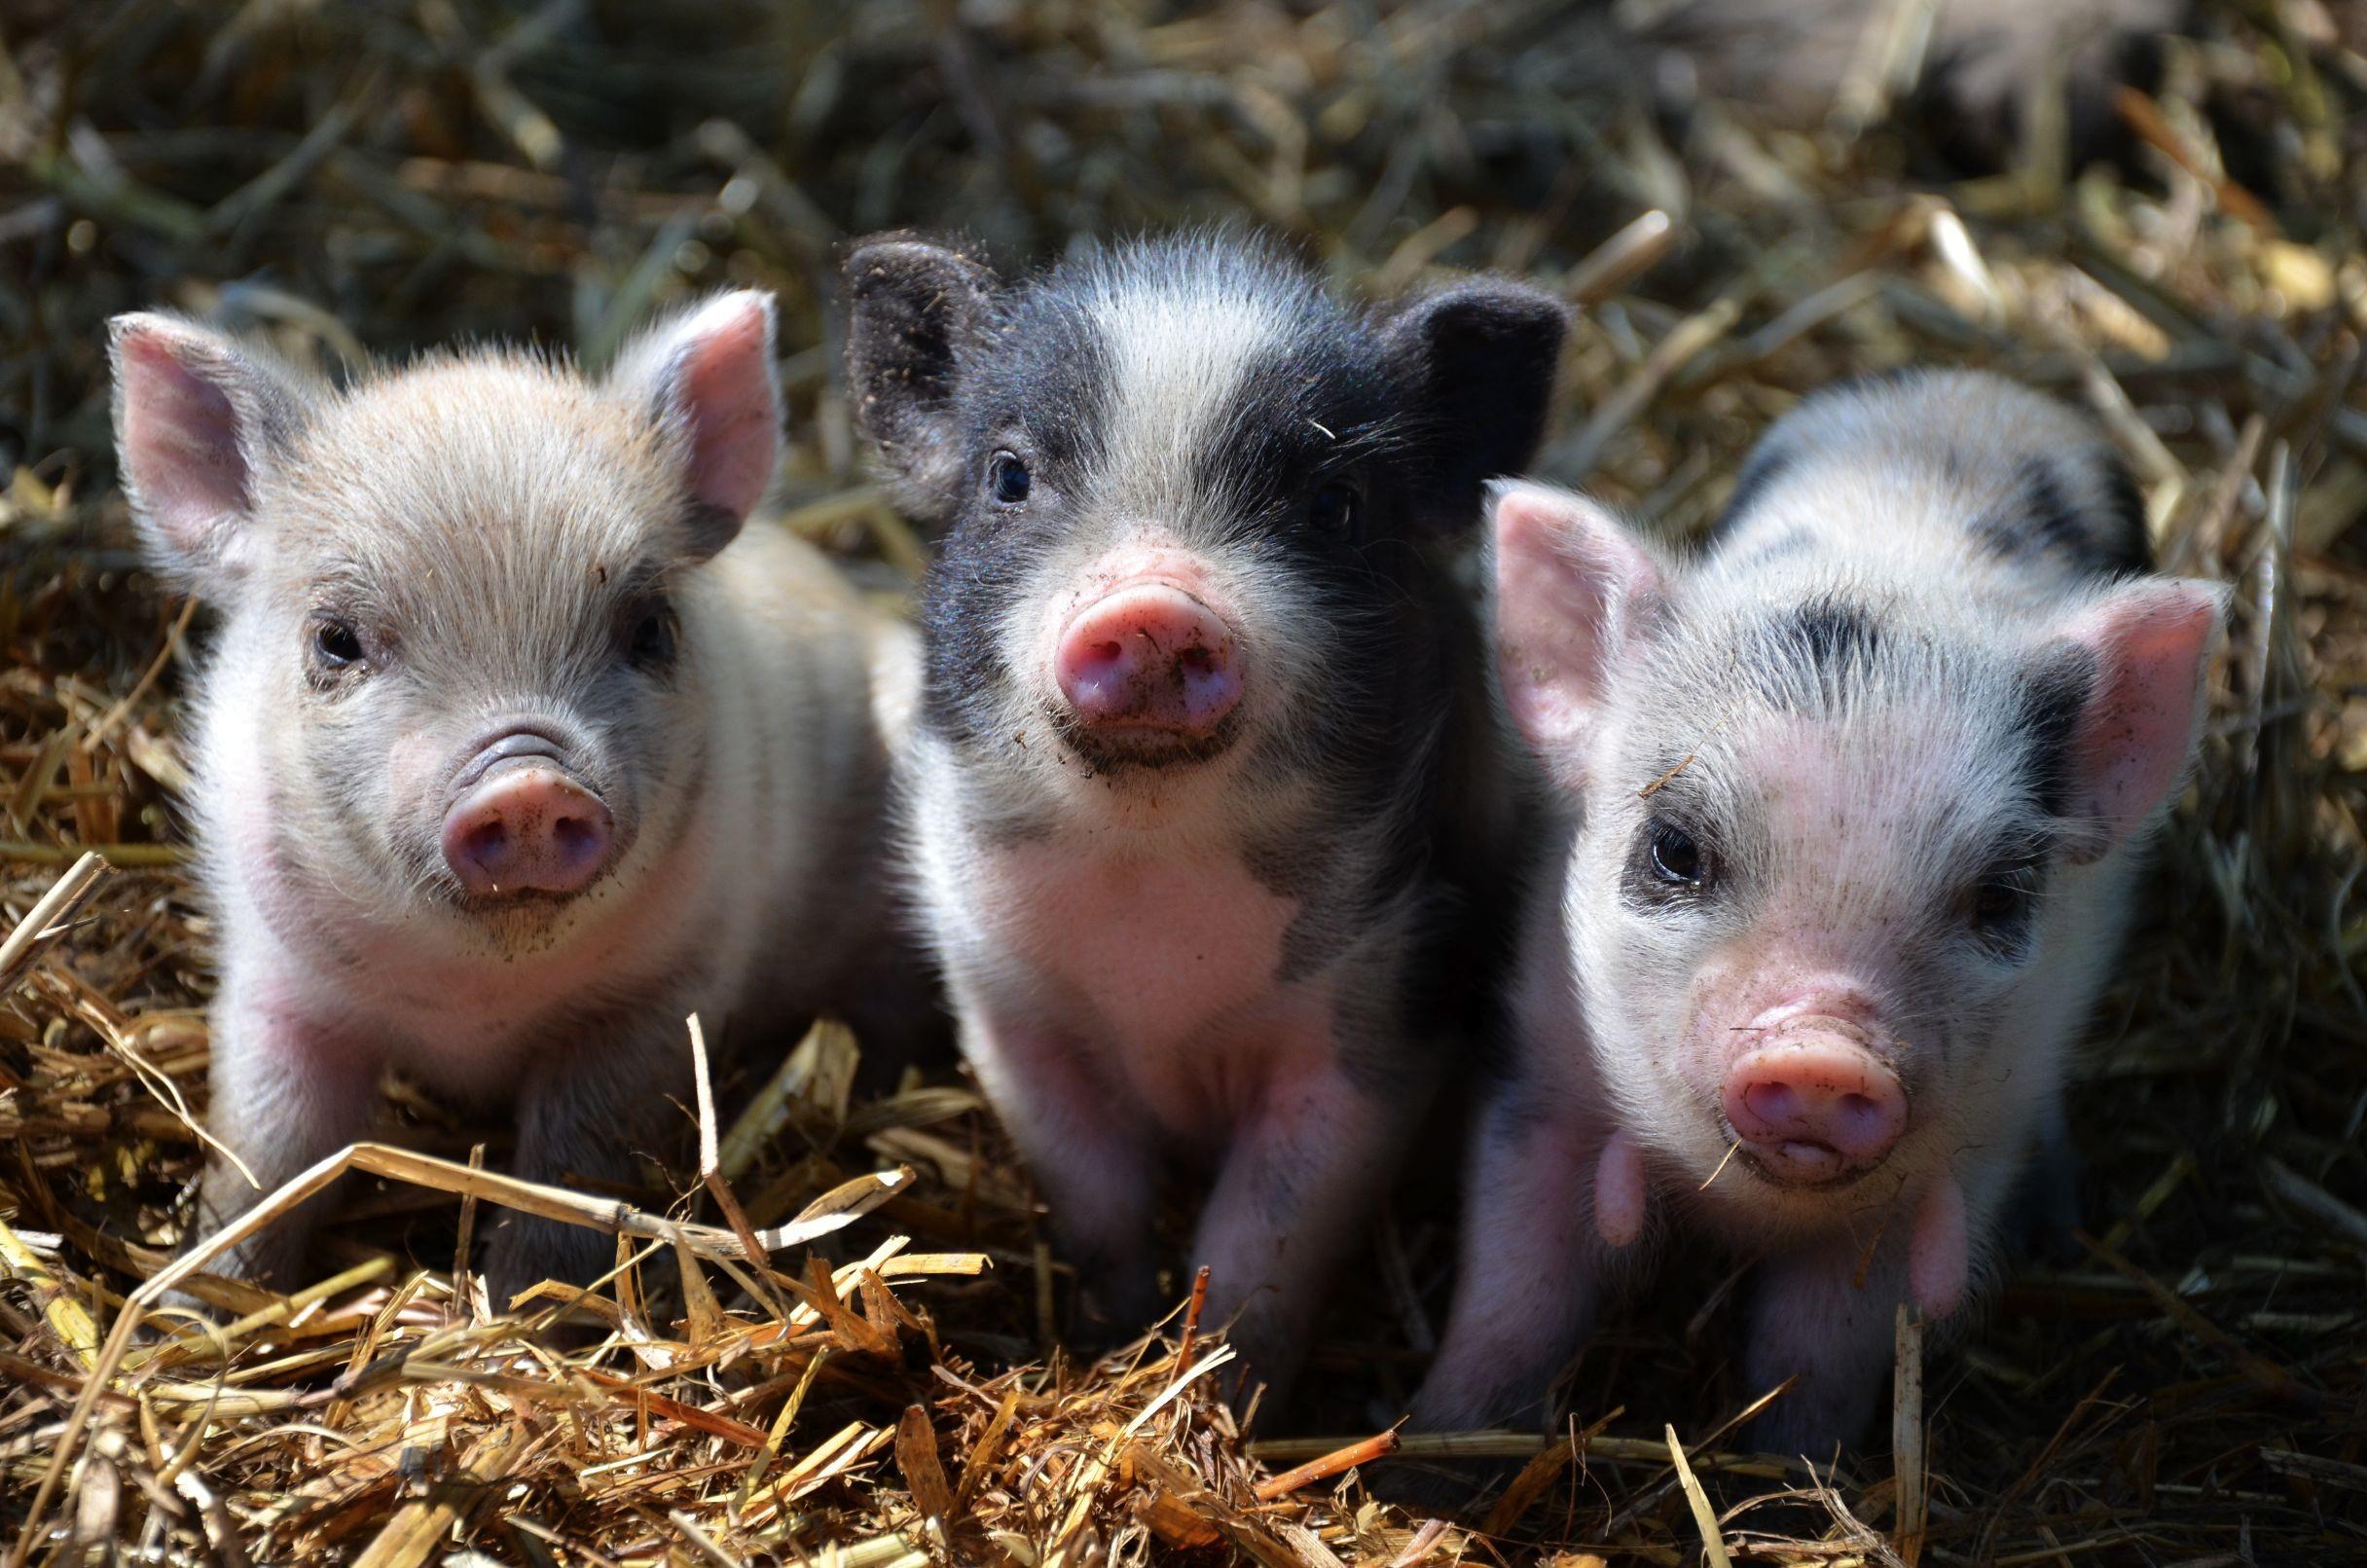 Cute Pig Wallpaper Backgrounds: Piglet Backgrounds (53+ Images